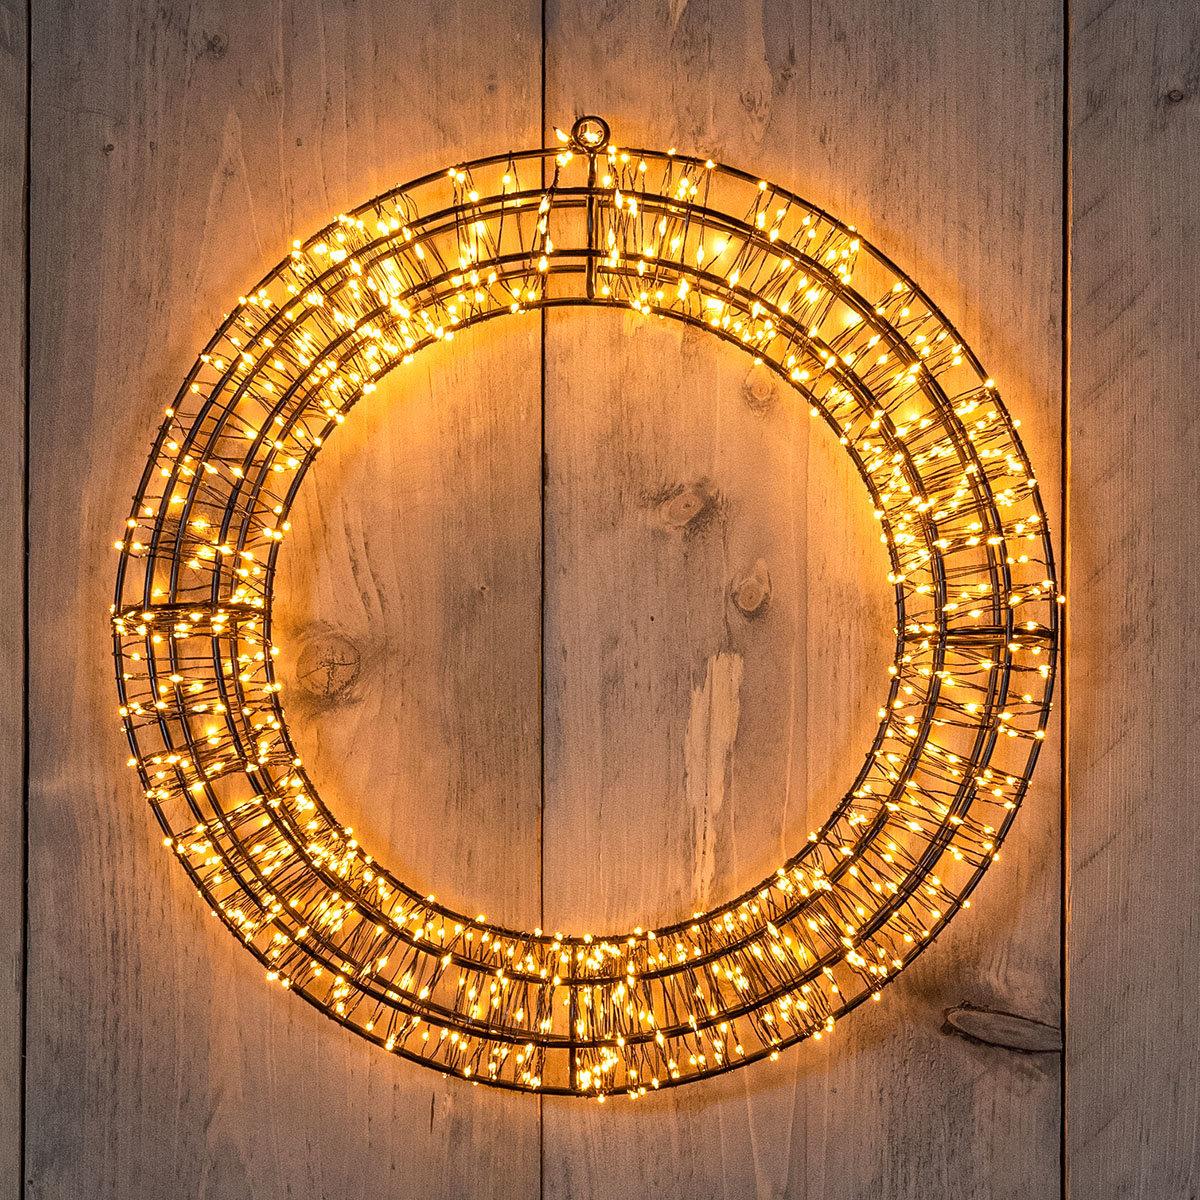 LED-Leuchtkranz, 800 LEDs, 36x5 cm, dimmbar